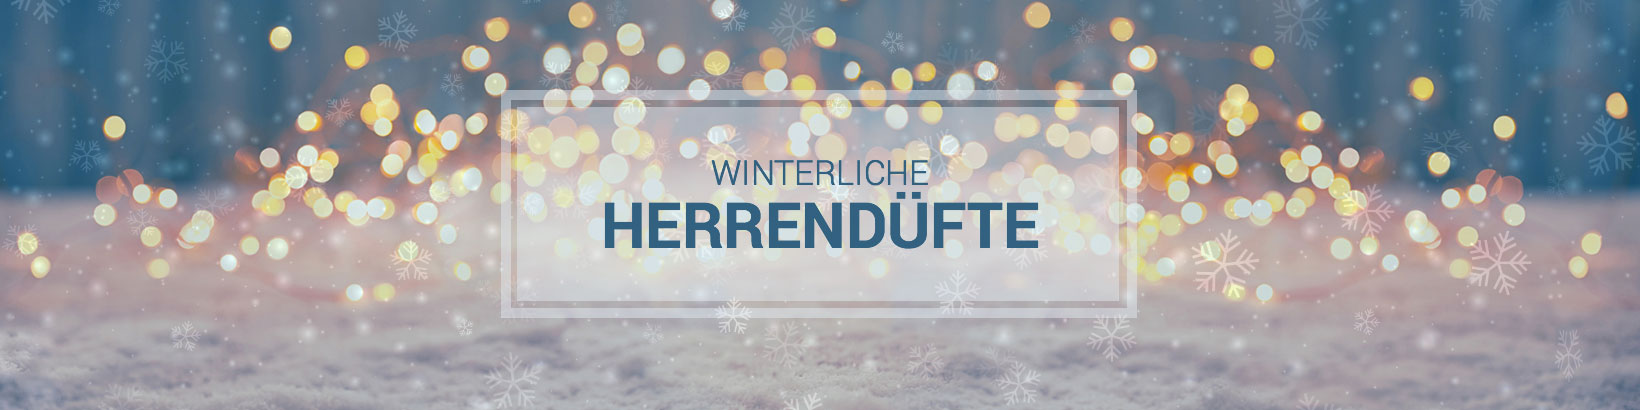 Visual-Winter-Herrenduefte-1640x410